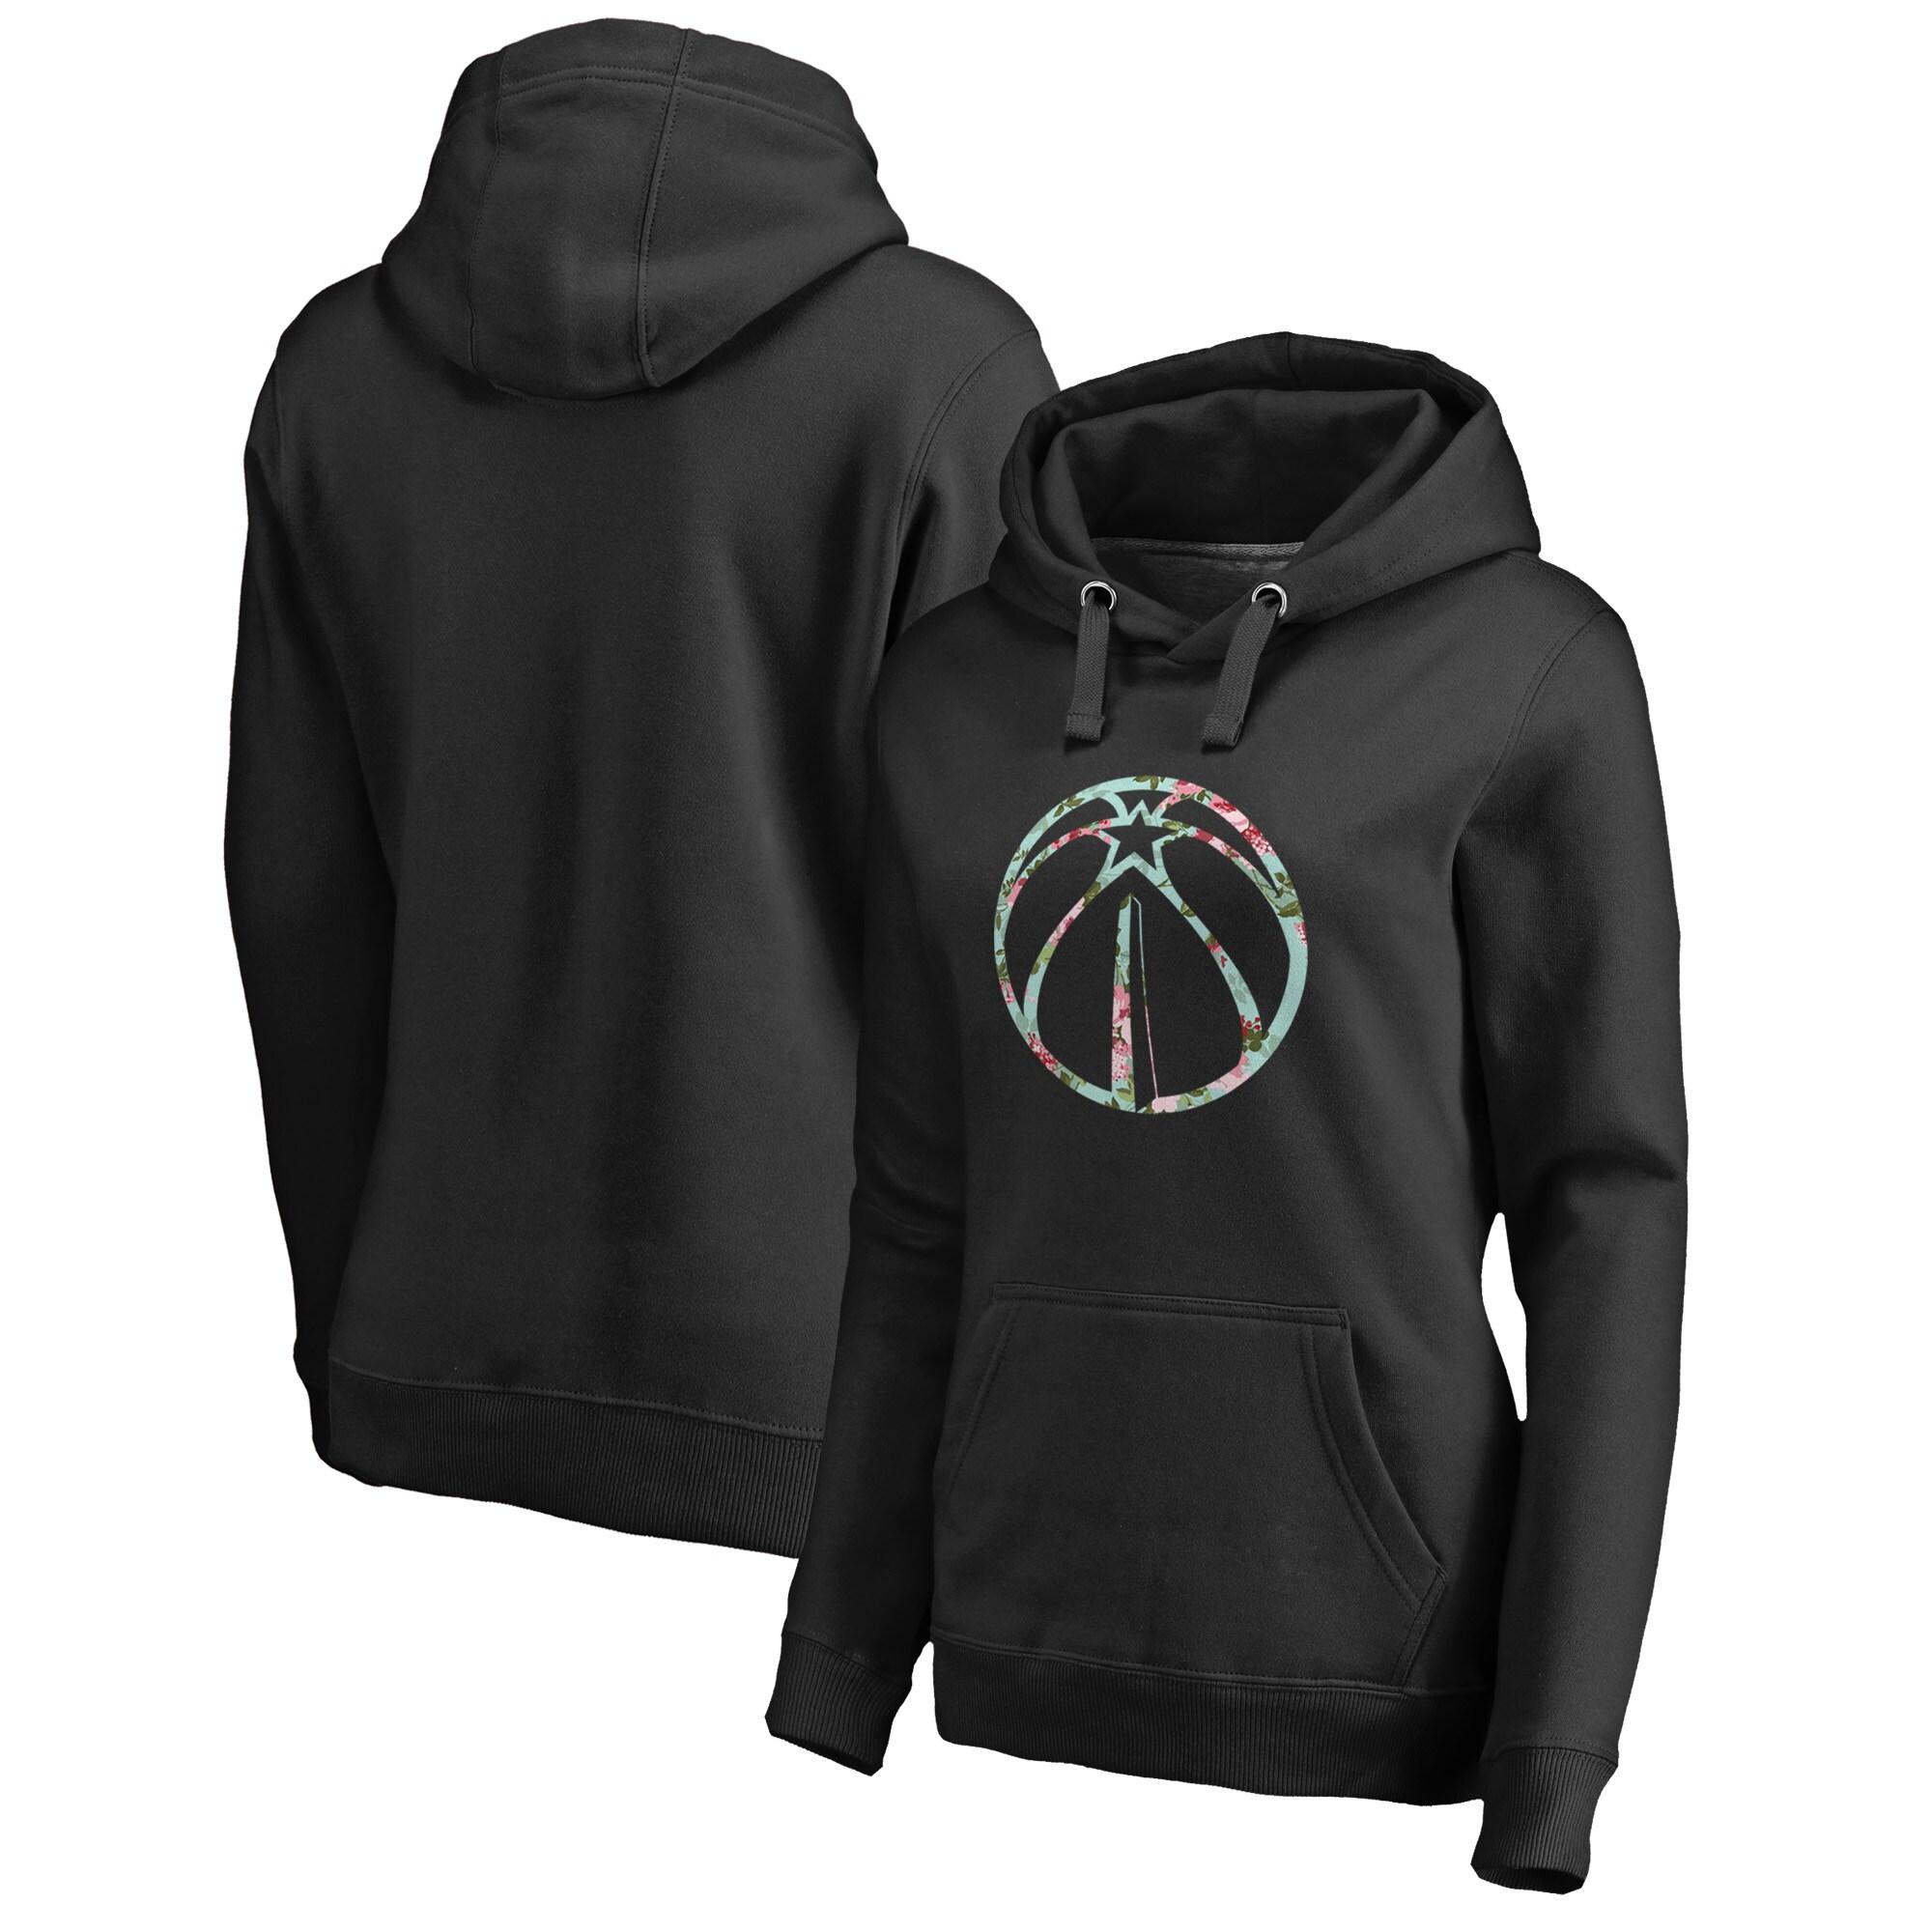 Washington Wizards Fanatics Branded Women's Lovely Pullover Hoodie - Black